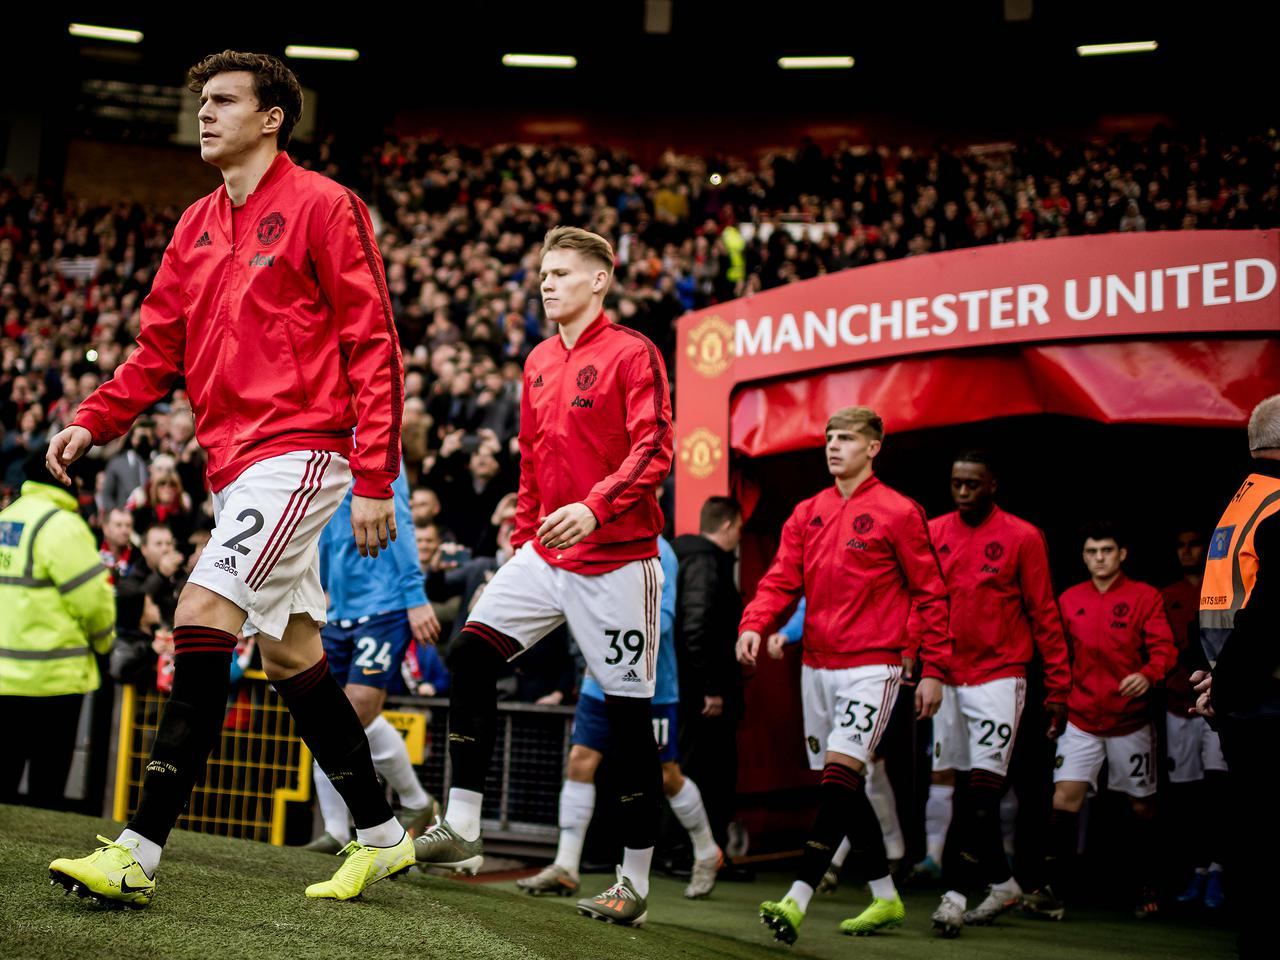 Match Recap Manchester United 3 Brighton 1 Manchester United